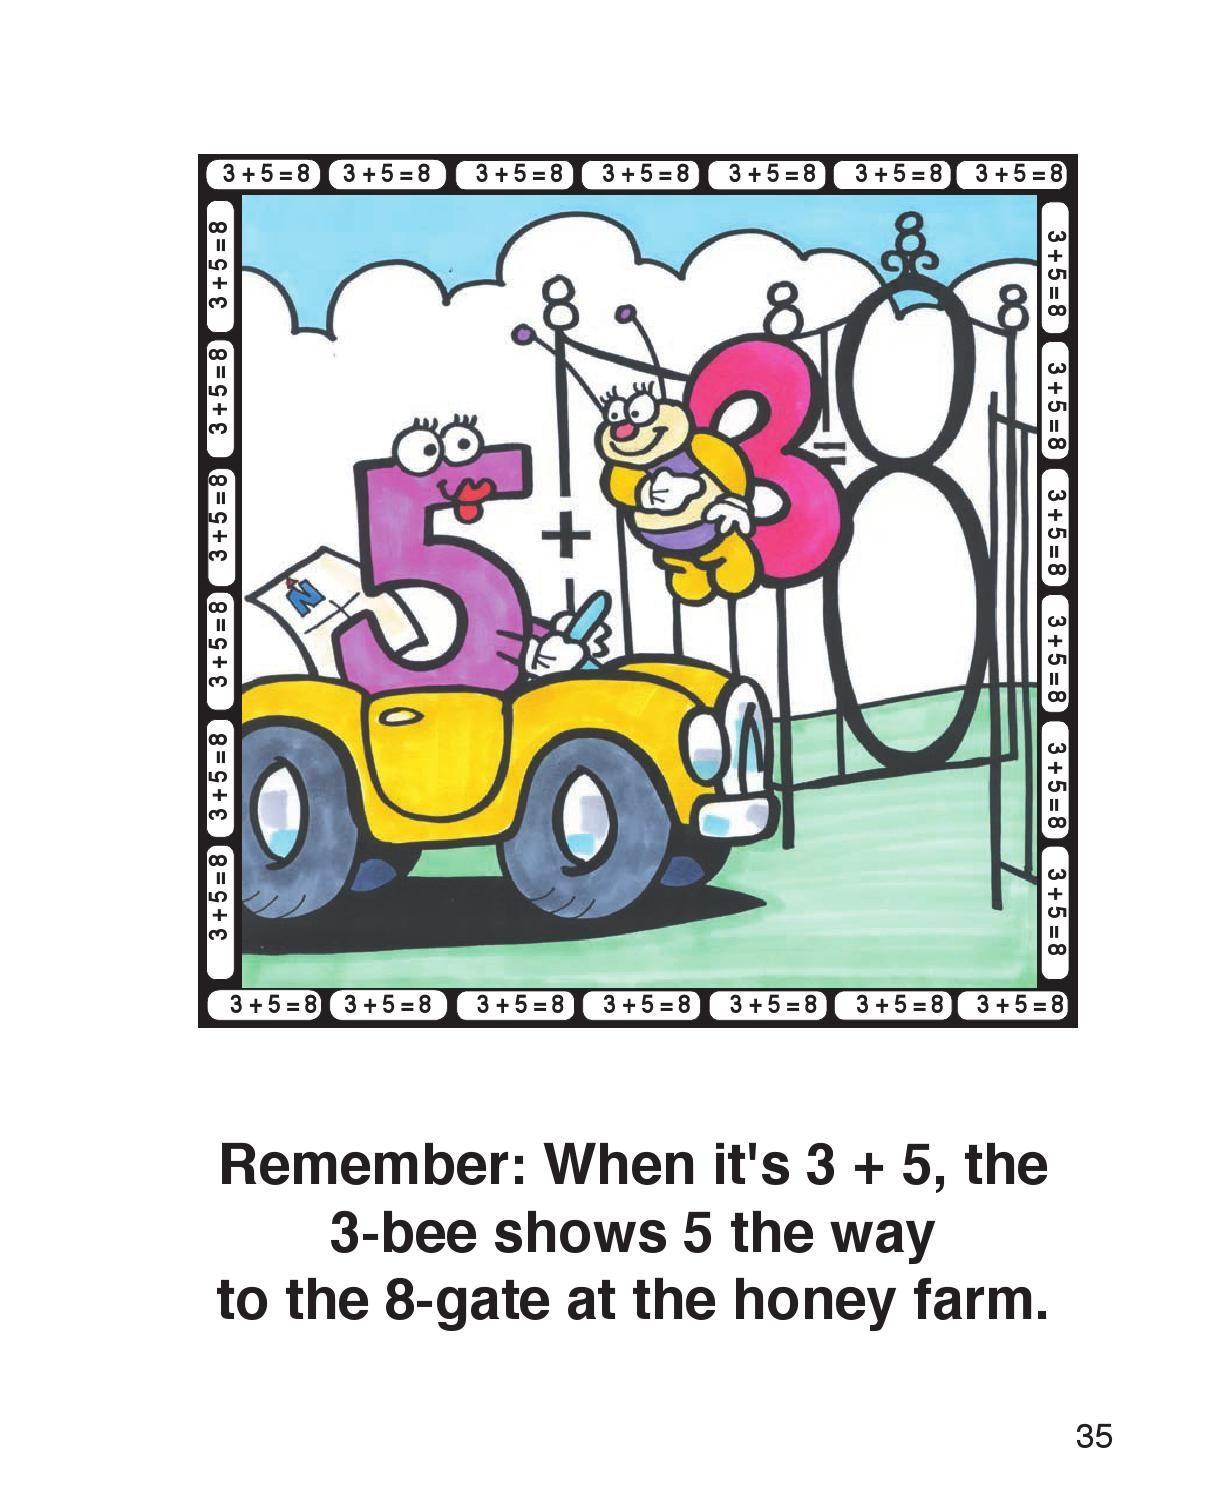 Addition The Fun Way Book For Kids Homeschool Math Math U See Books [ 1496 x 1232 Pixel ]